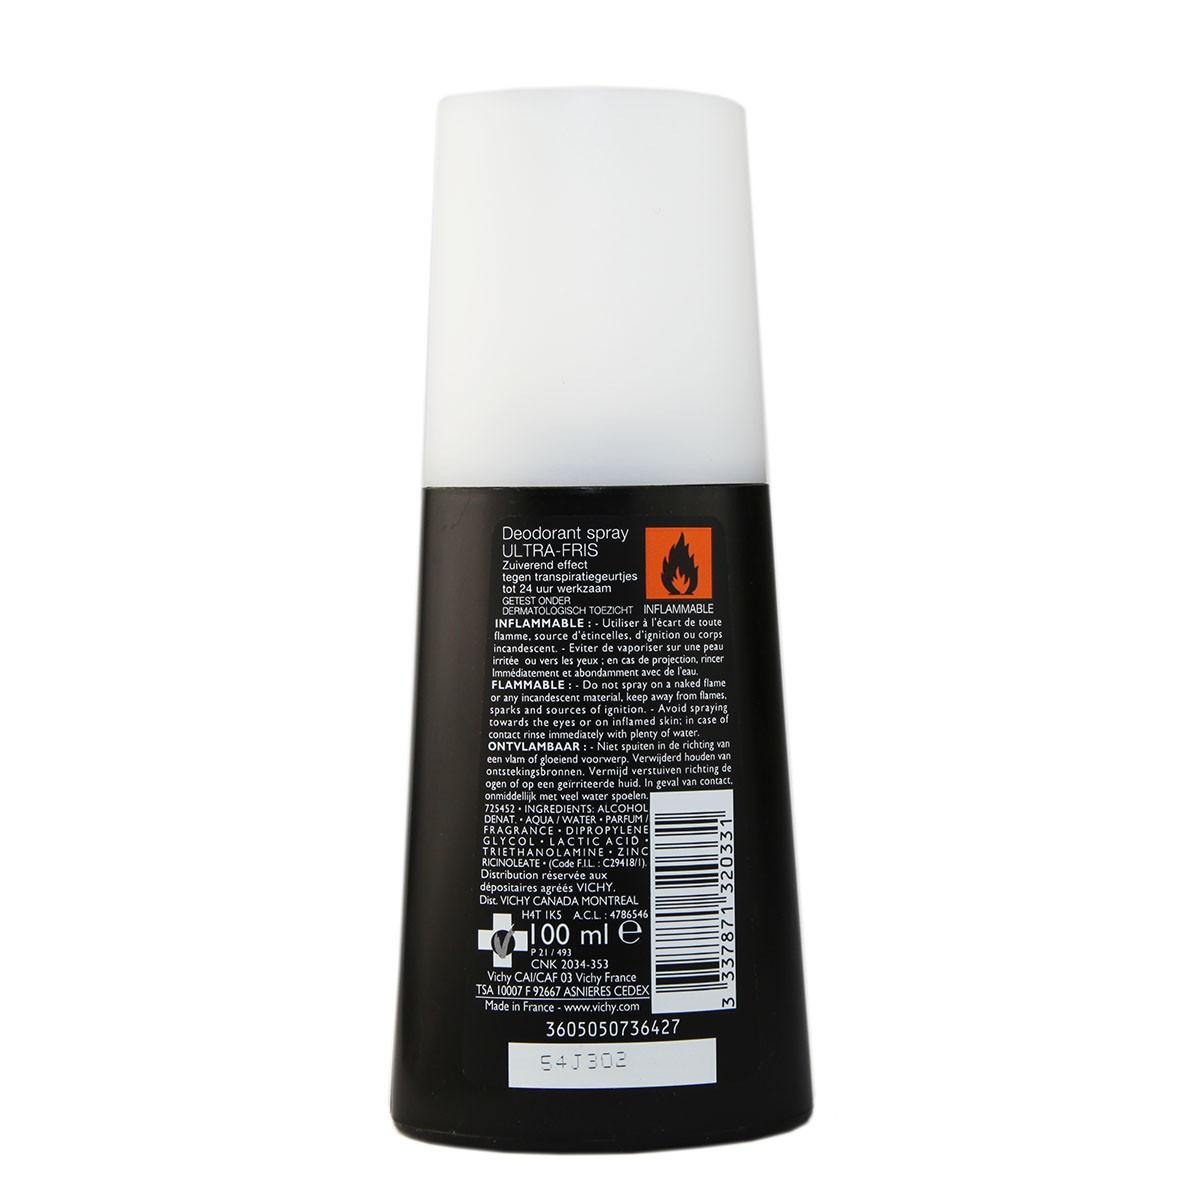 Vichy Homme Ultra Refreshing Deodorant Spray